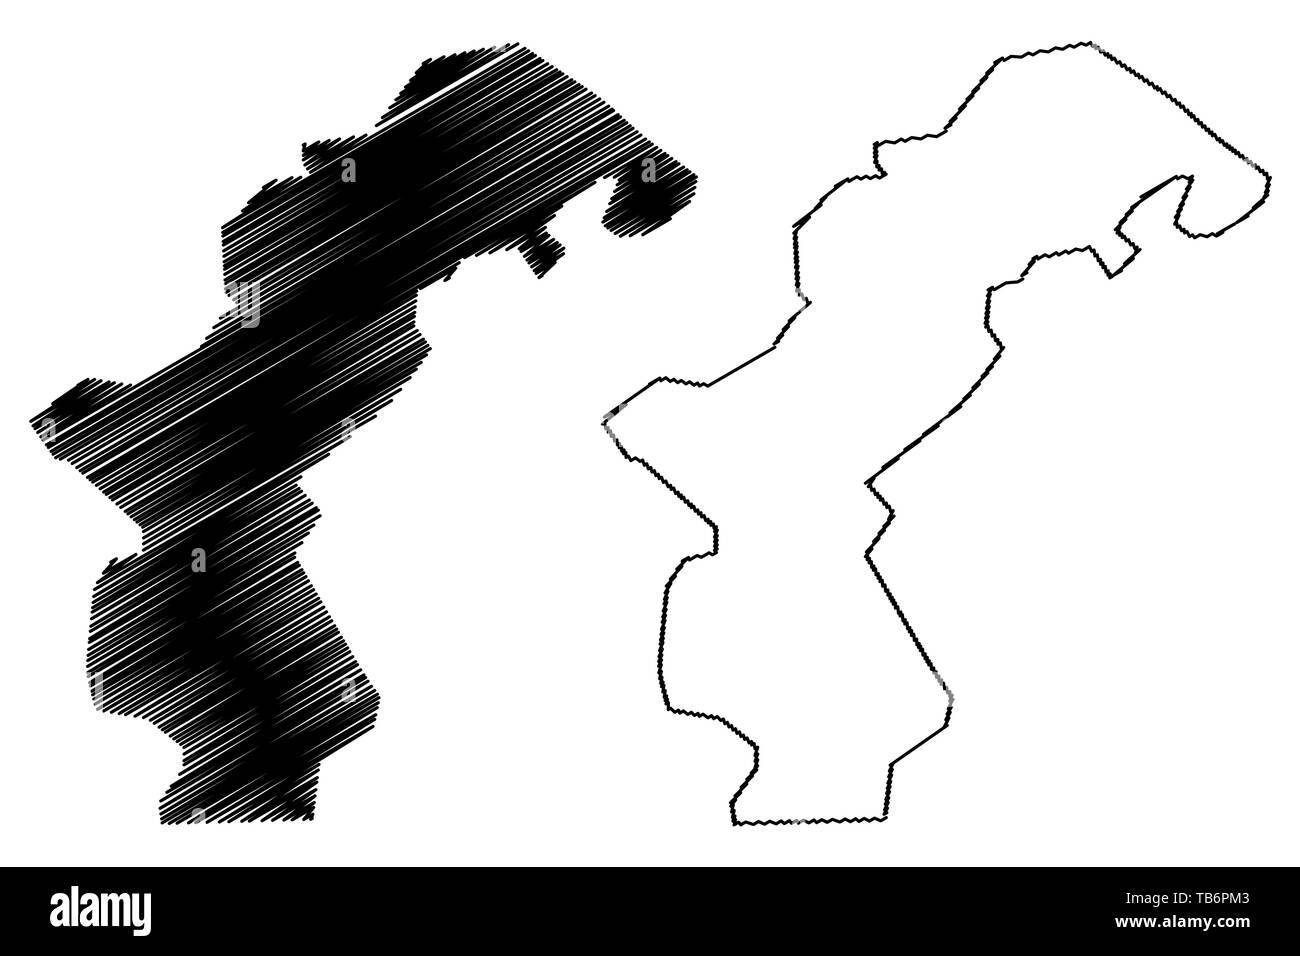 Amanat Al Asimah Governorate (Governorates of Yemen, Republic of Yemen) map vector illustration, scribble sketch Sanaa or Sana map - Stock Vector